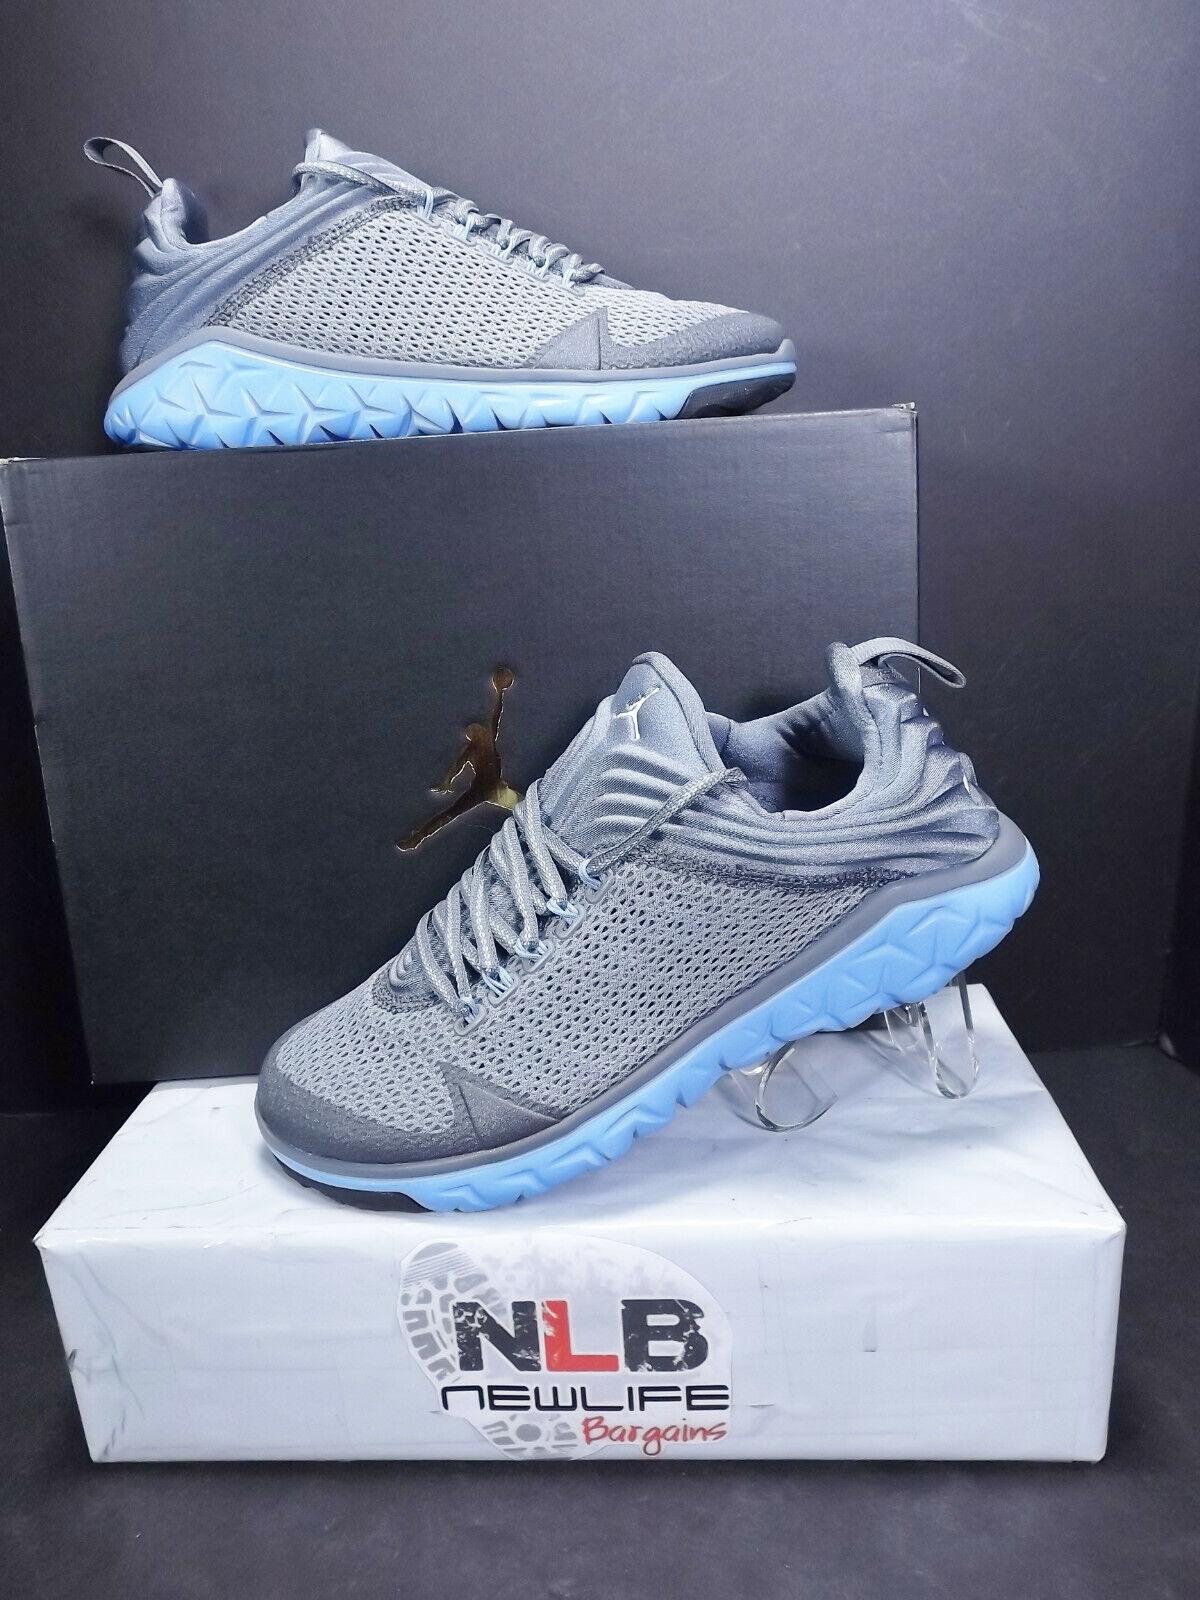 84c292e3c2 Nike Air Jordan Flight Flex Trainer 654268-006 Cool Grey White bluee Men  Size 7